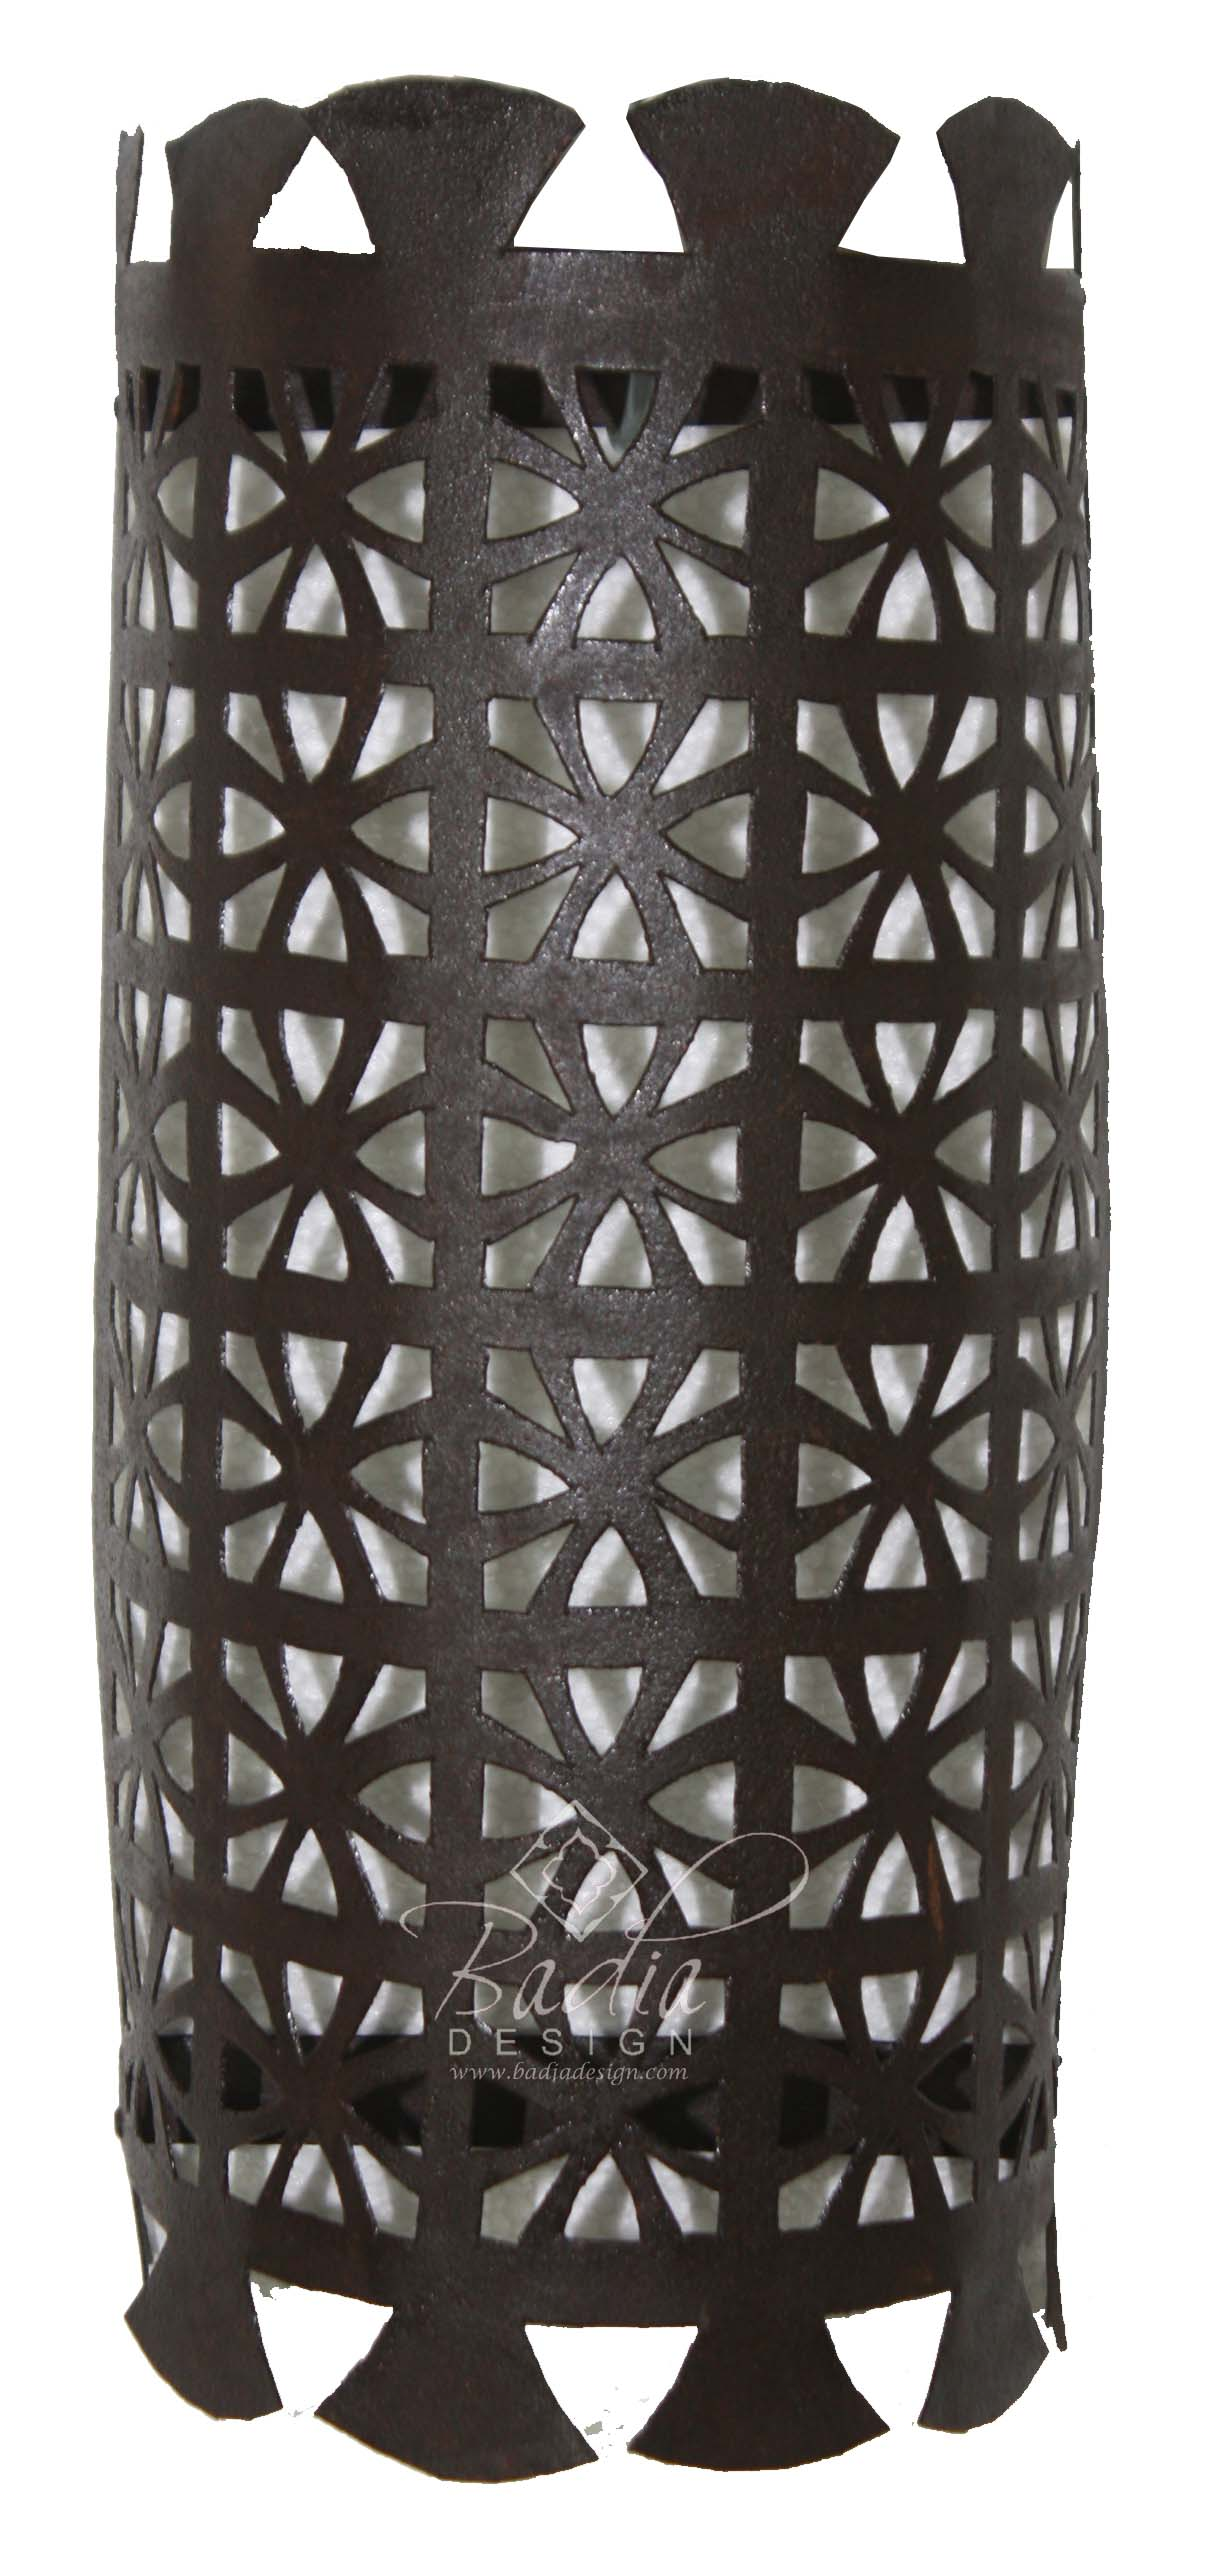 moroccan-rustic-iron-wall-sconce-wl227.jpg